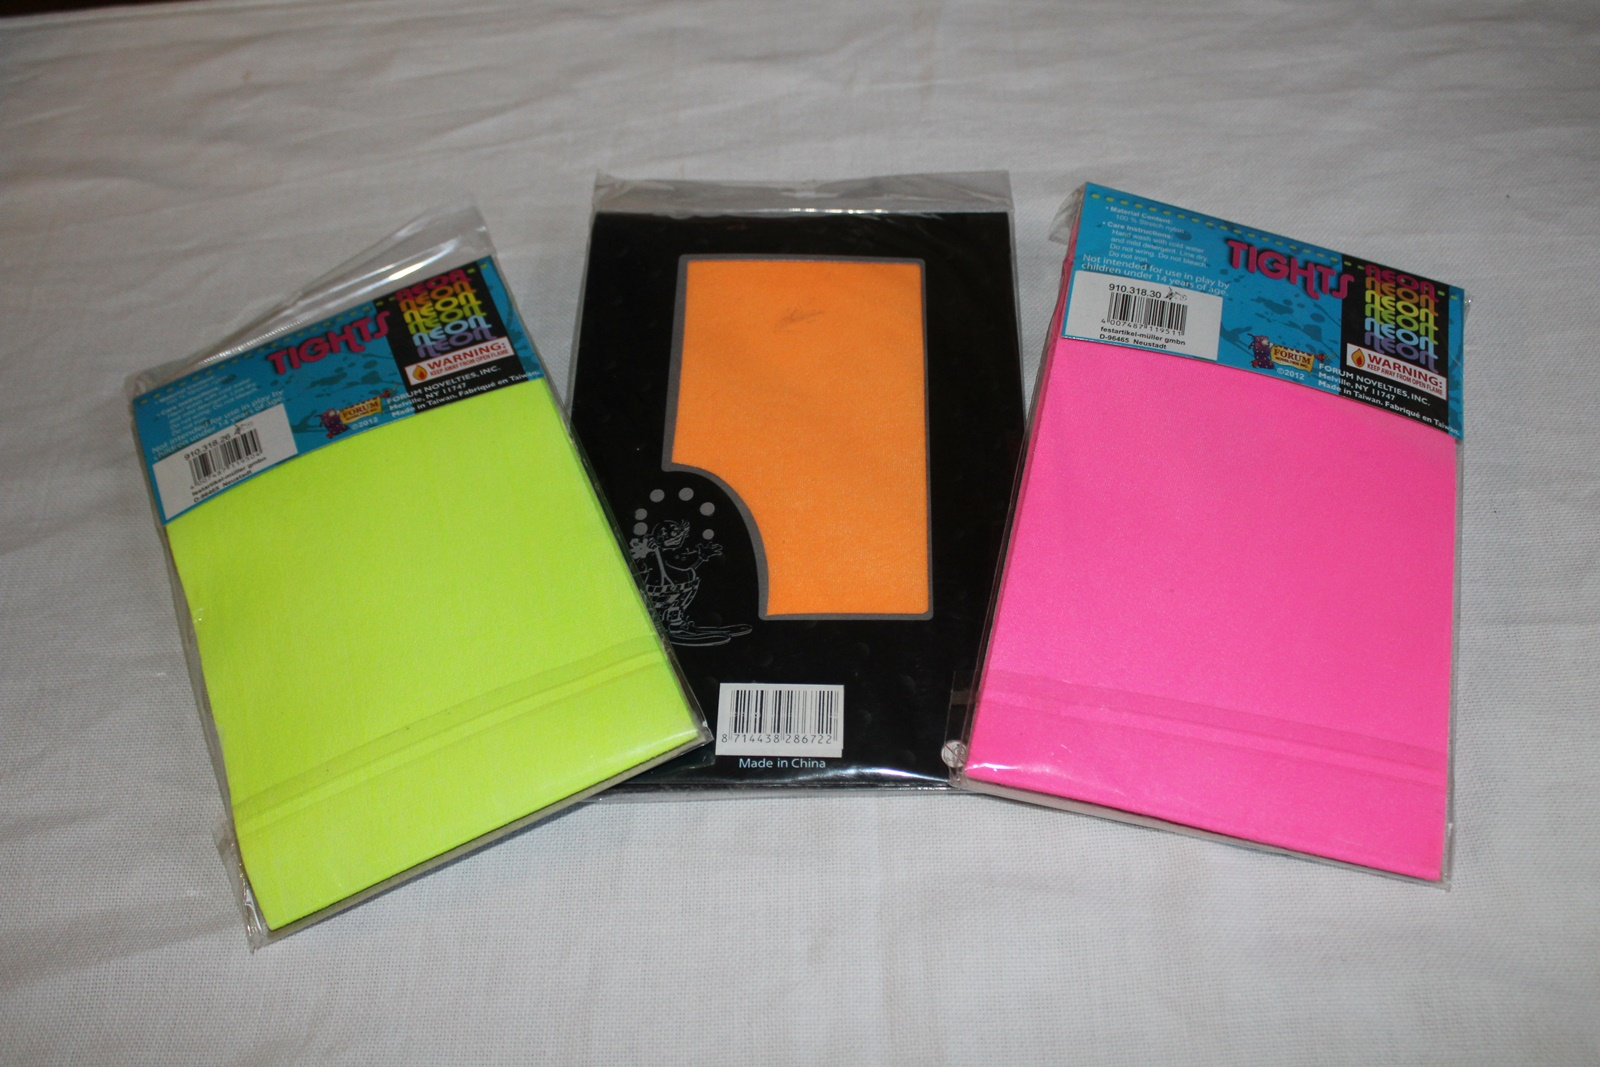 strumpfhose neon pink orange grun einheitsgrobe damen karneval kvn243 vJRcqjeCe24VIa